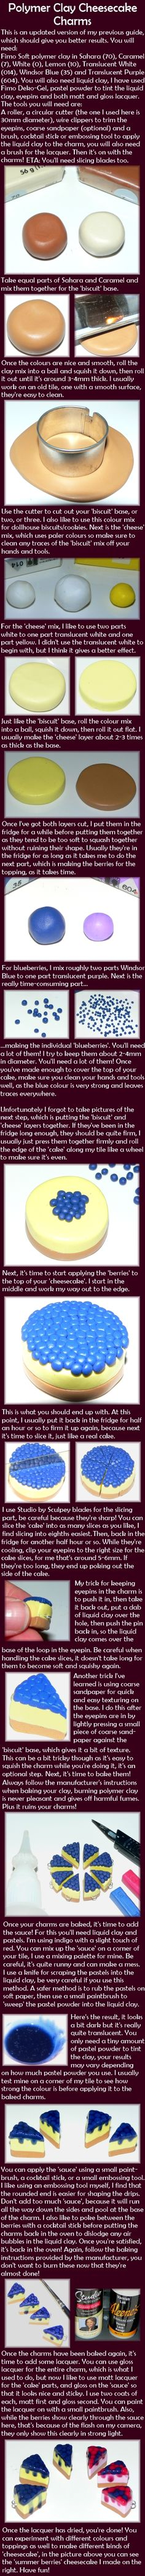 New Cheesecake Tutorial by jen-kollic.deviantart.com